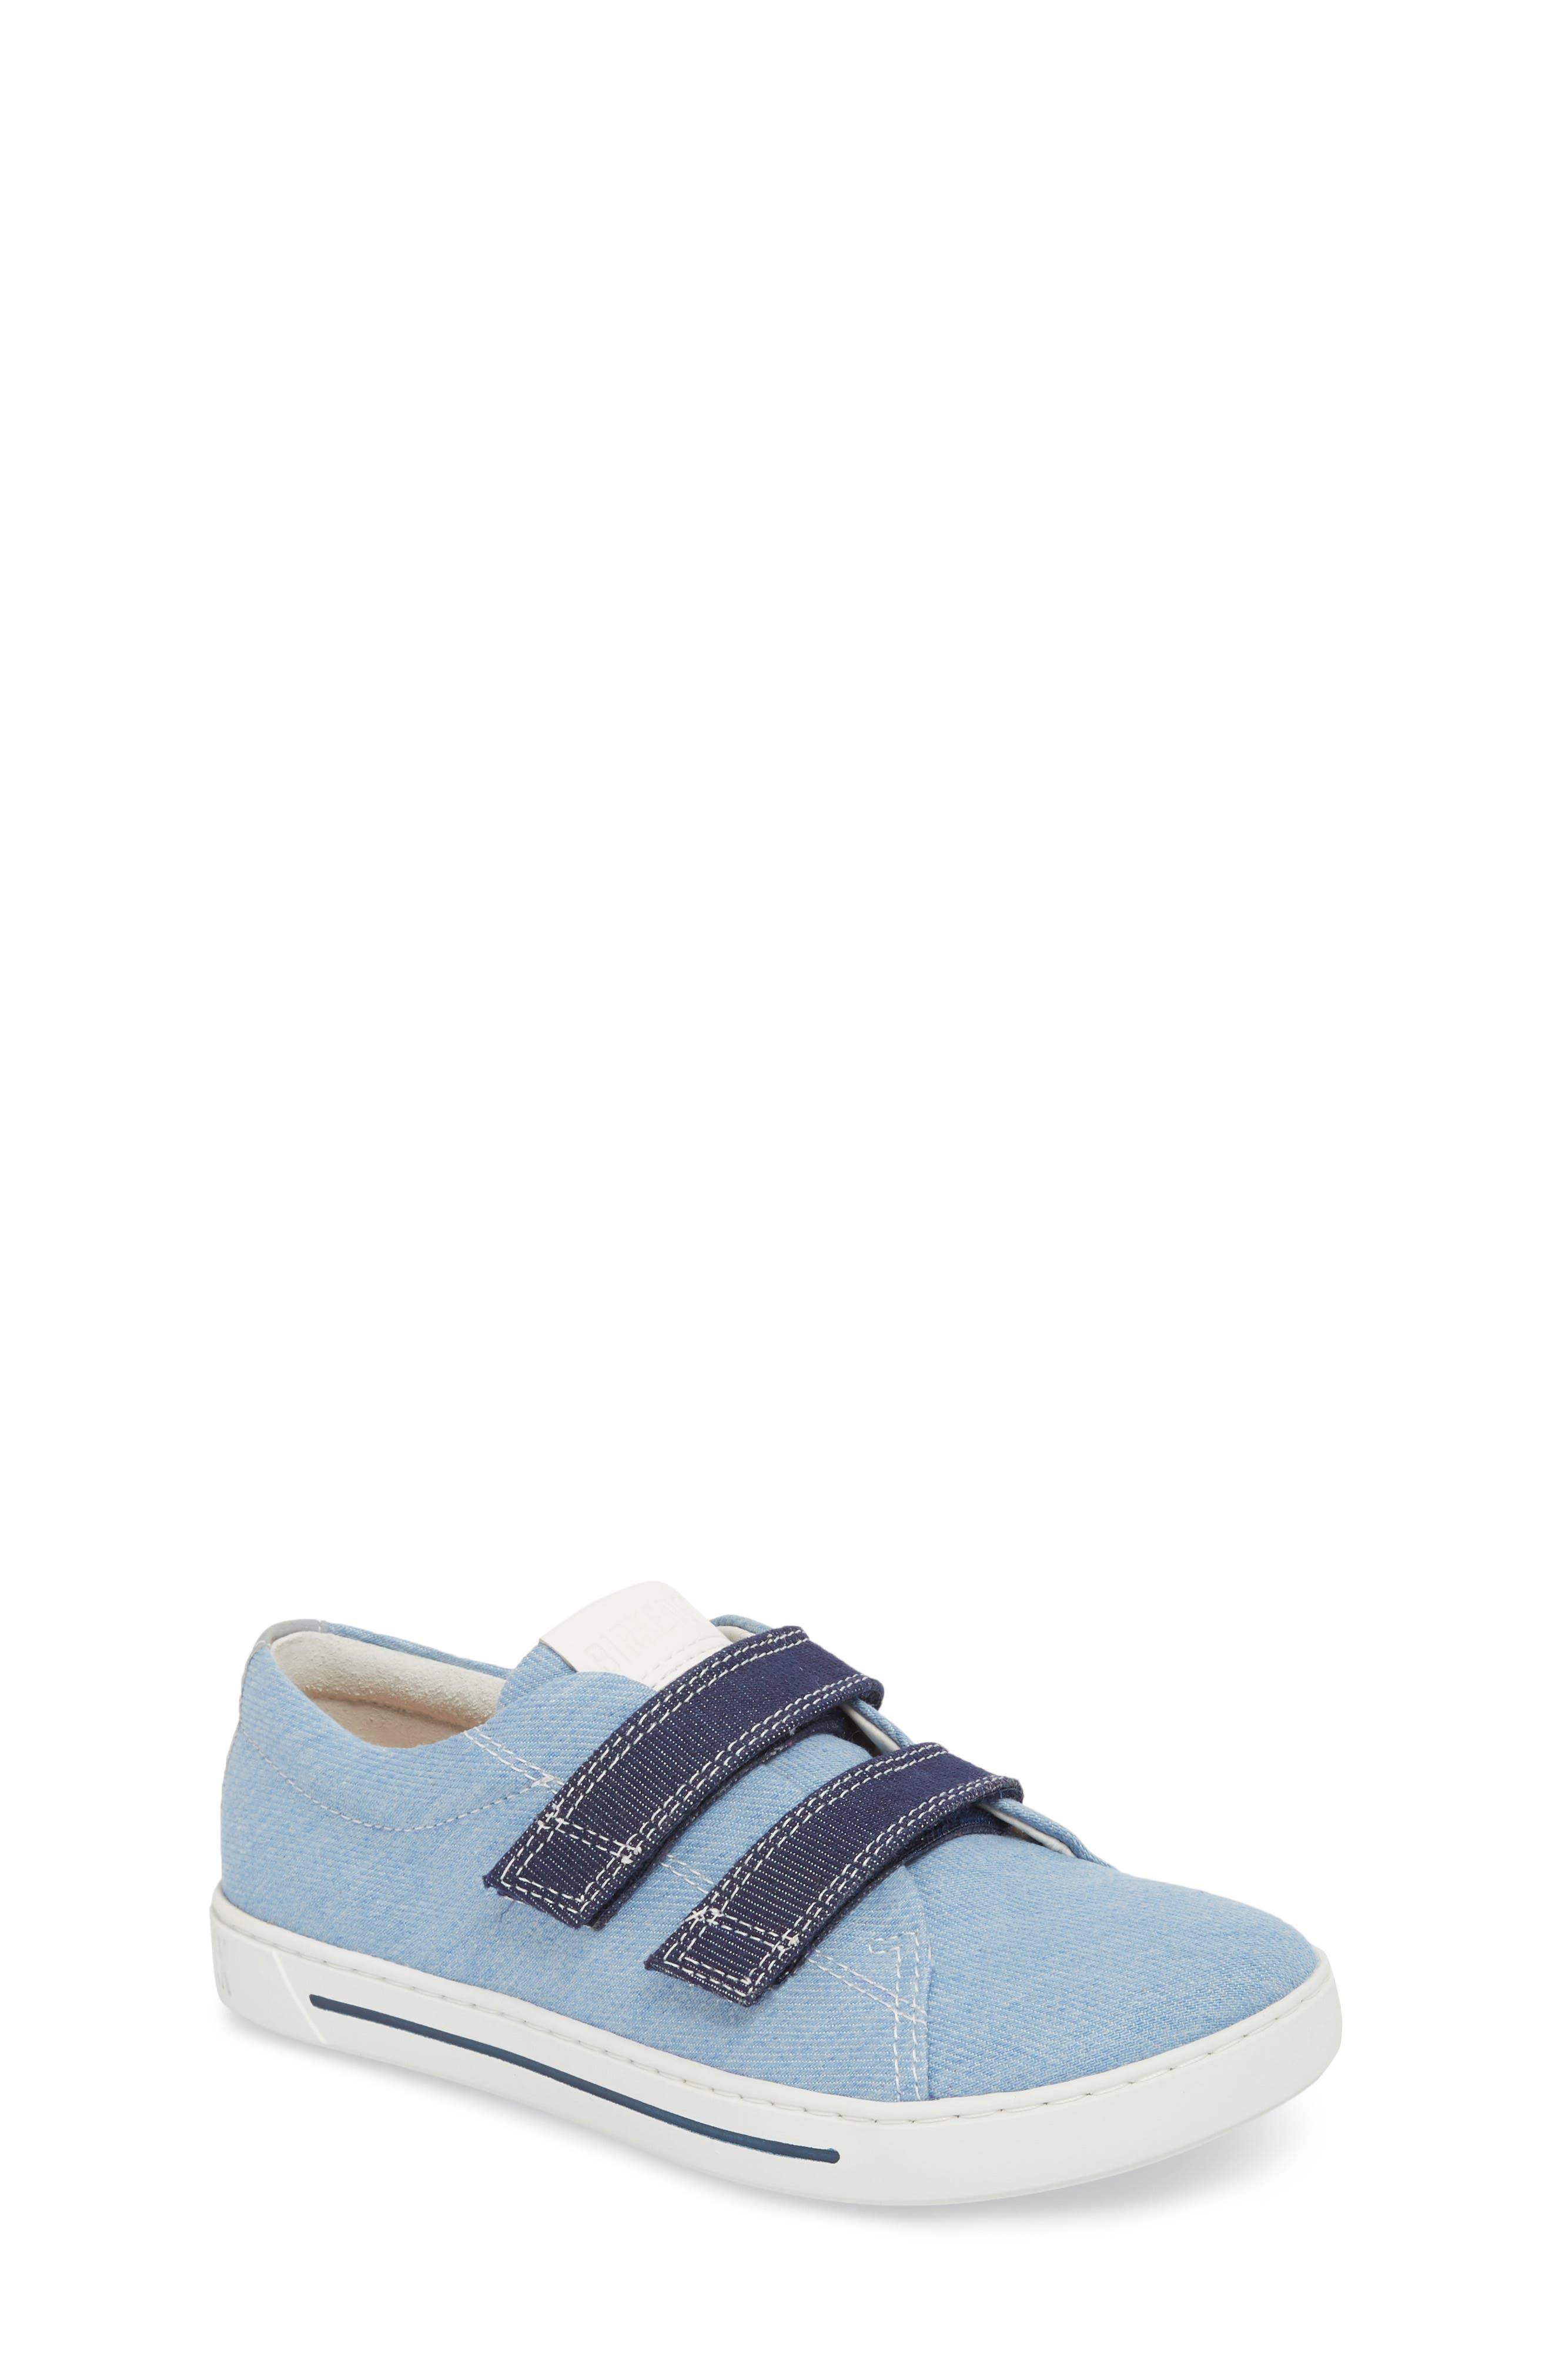 Arran Sneaker,                             Main thumbnail 1, color,                             400